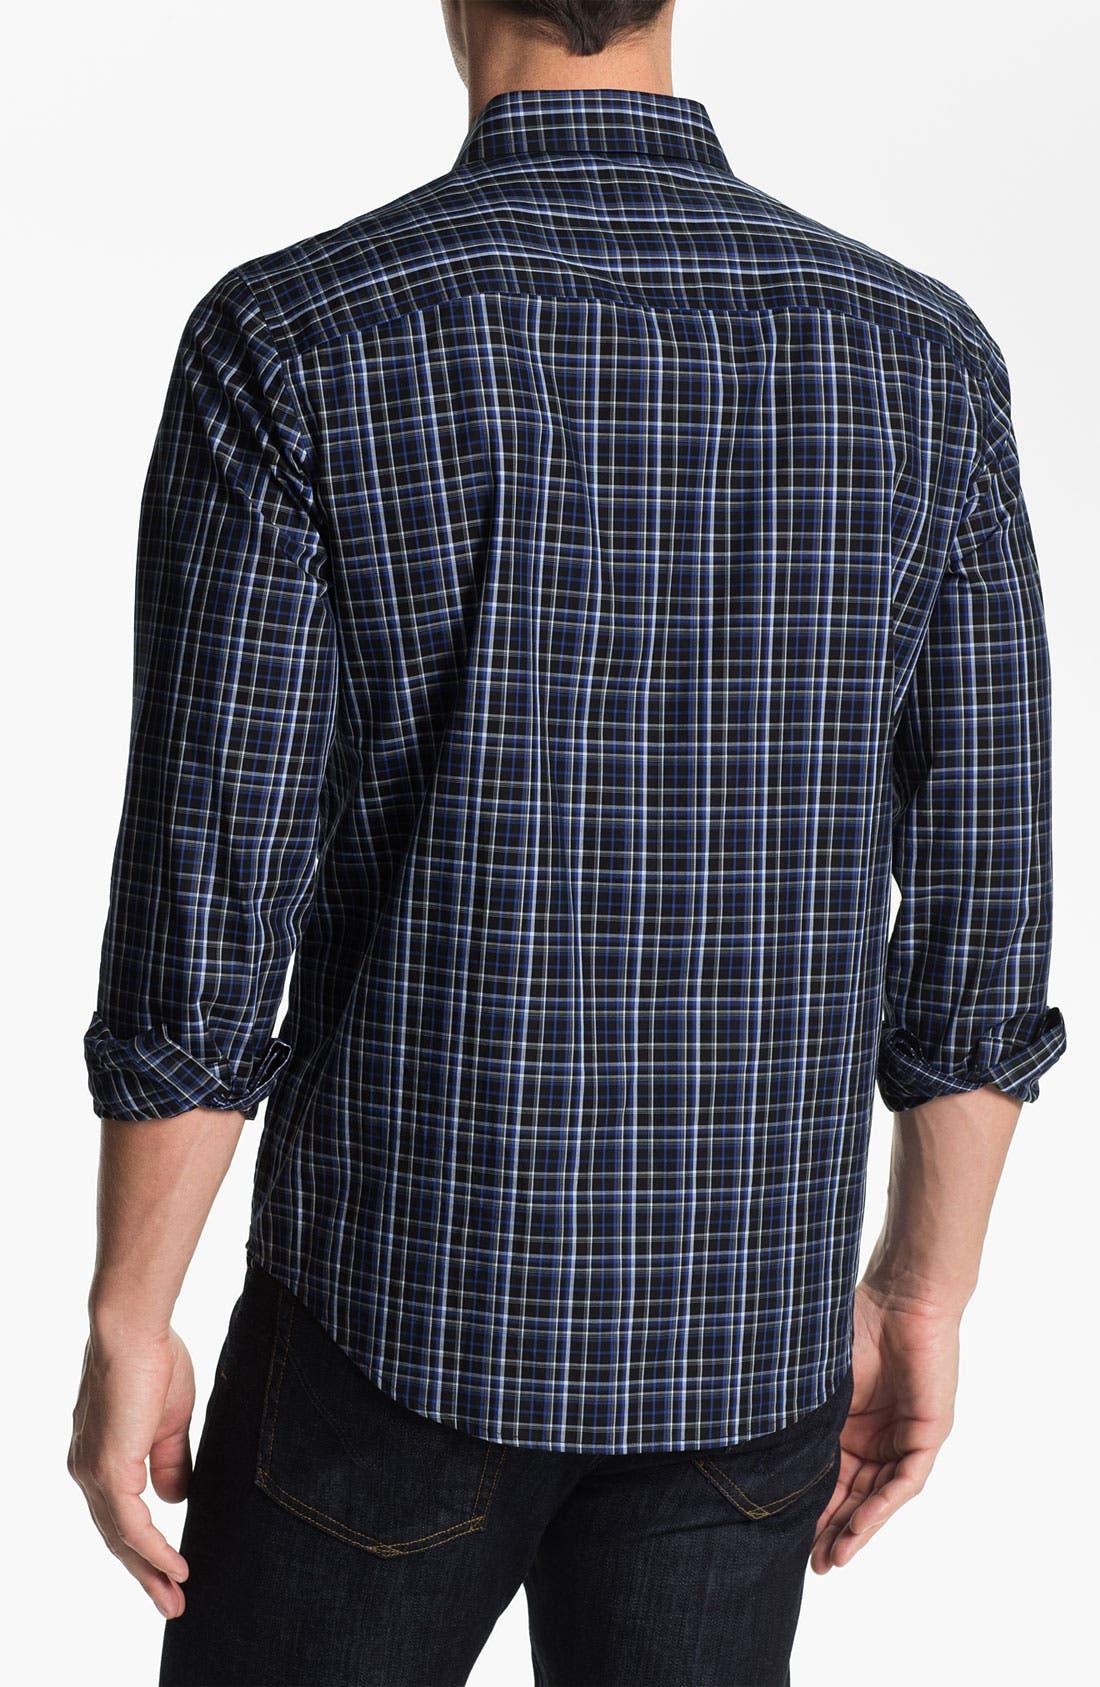 Alternate Image 2  - Michael Kors 'Cyd Check' Sport Shirt